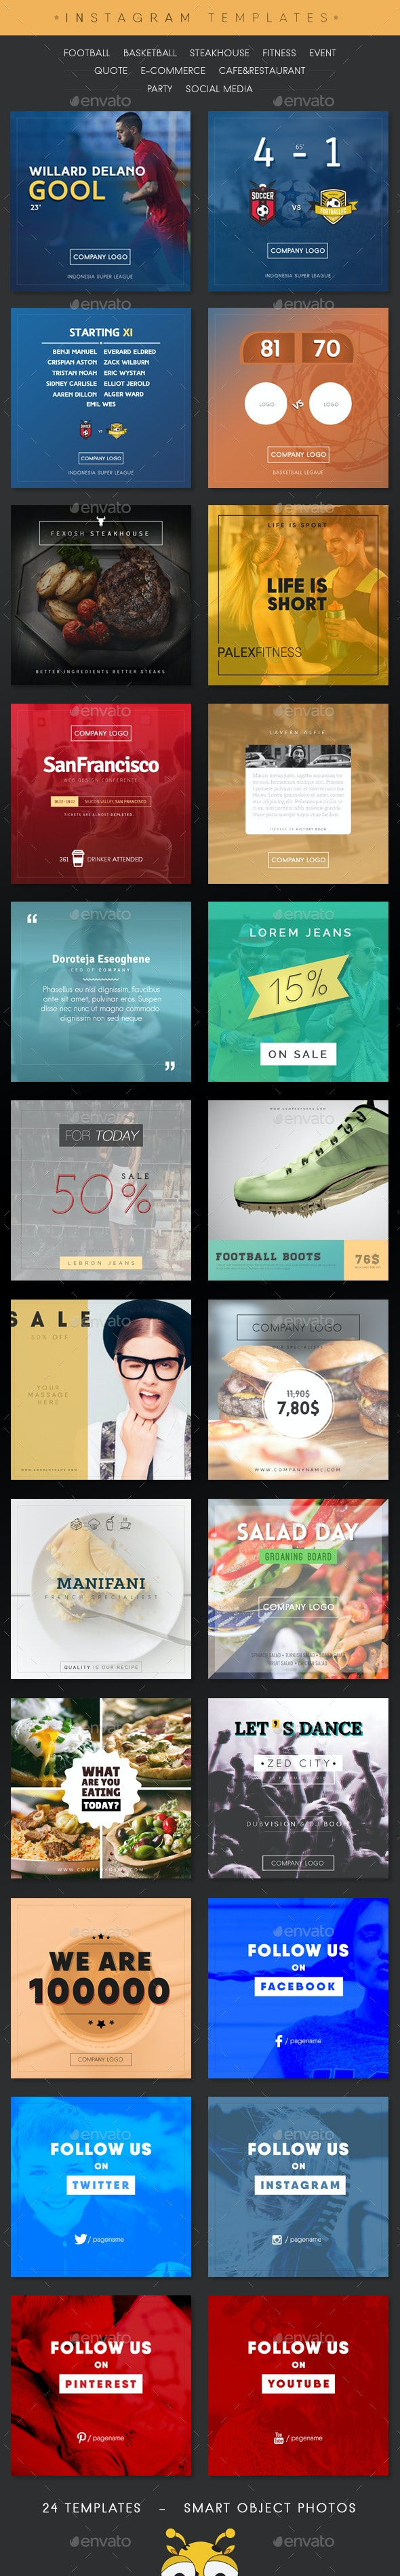 InstaTemp Instagram Templates - Social Media Web Elements